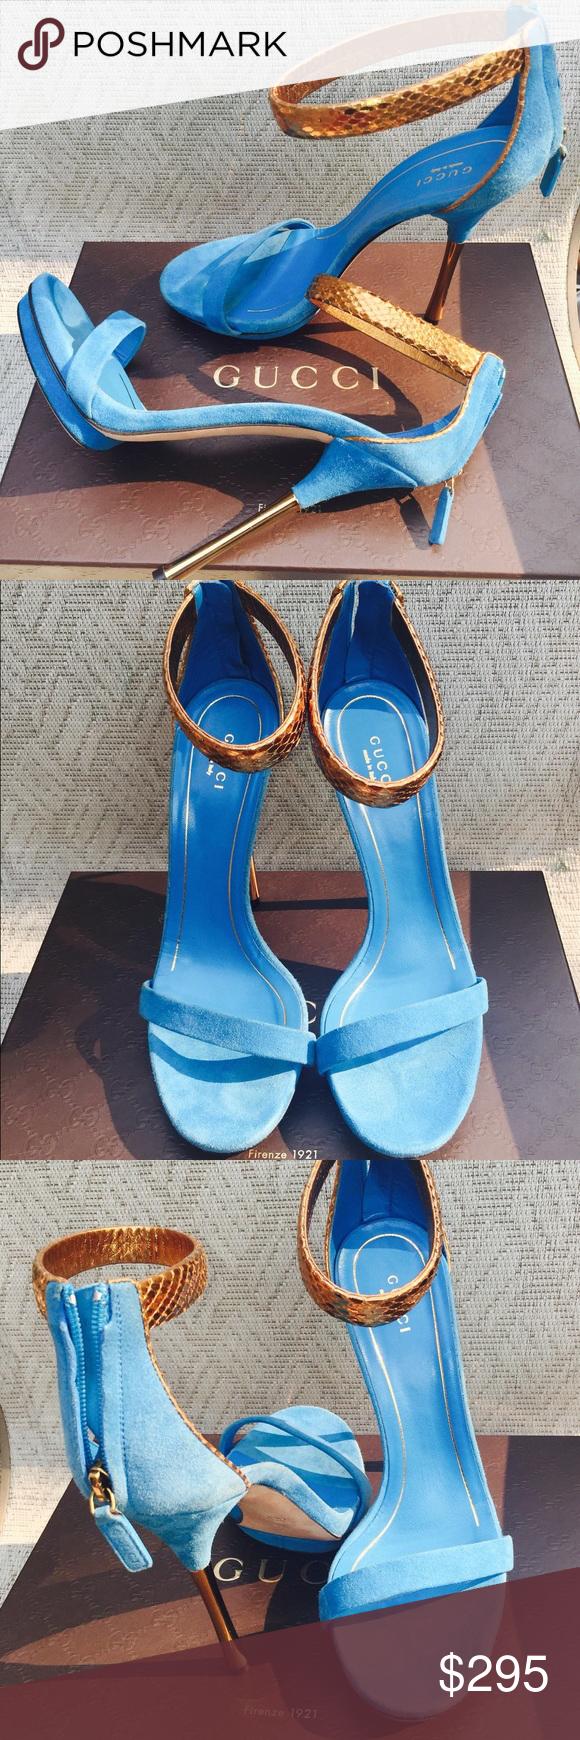 e00836768ede BNIB Blue Gucci Kelis Sandals EU 39 US 8 8.5!!!! ~ Beautiful